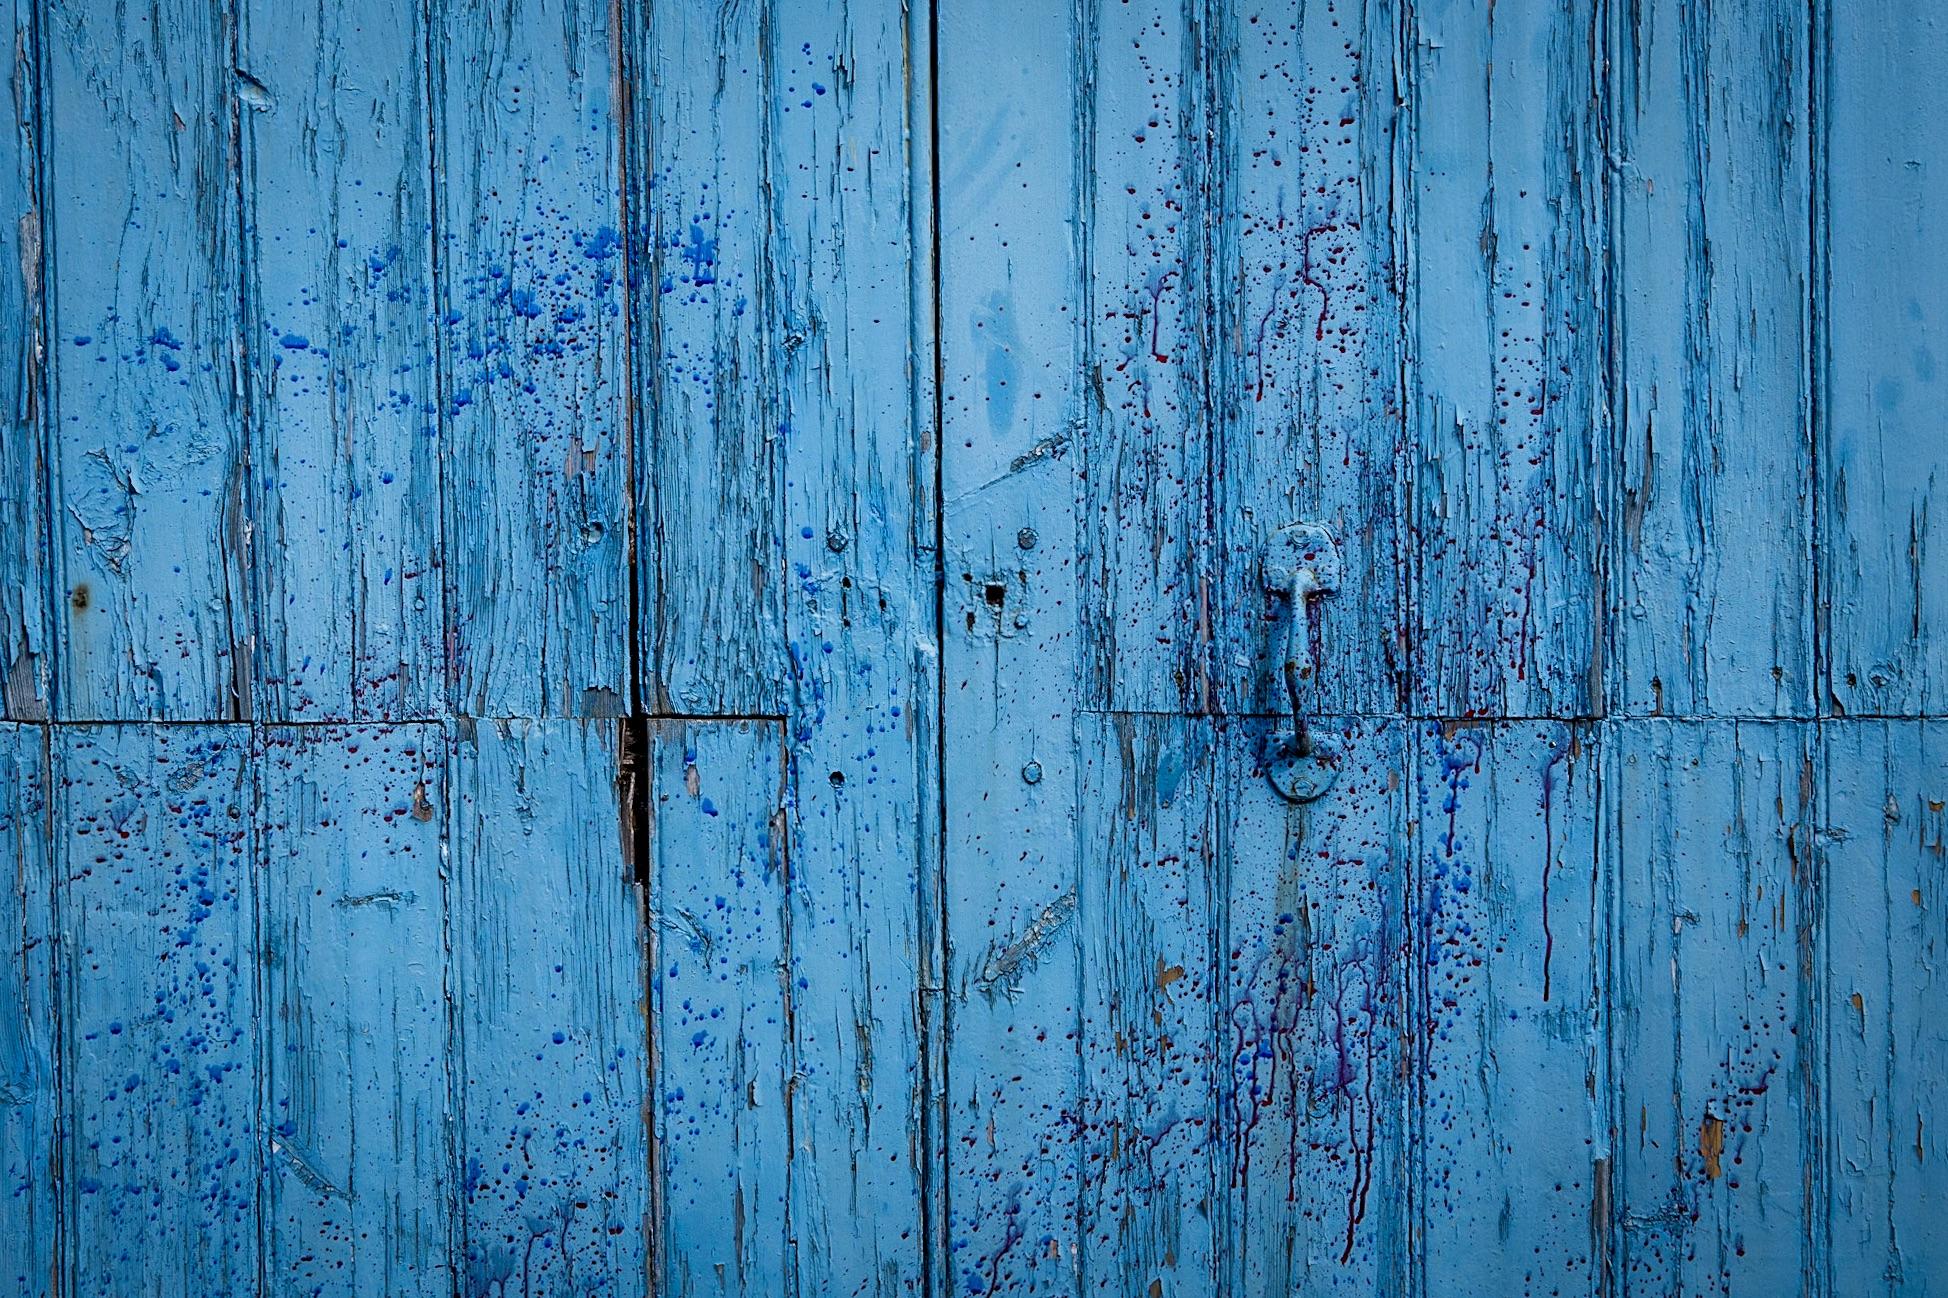 The textures In an old painted door